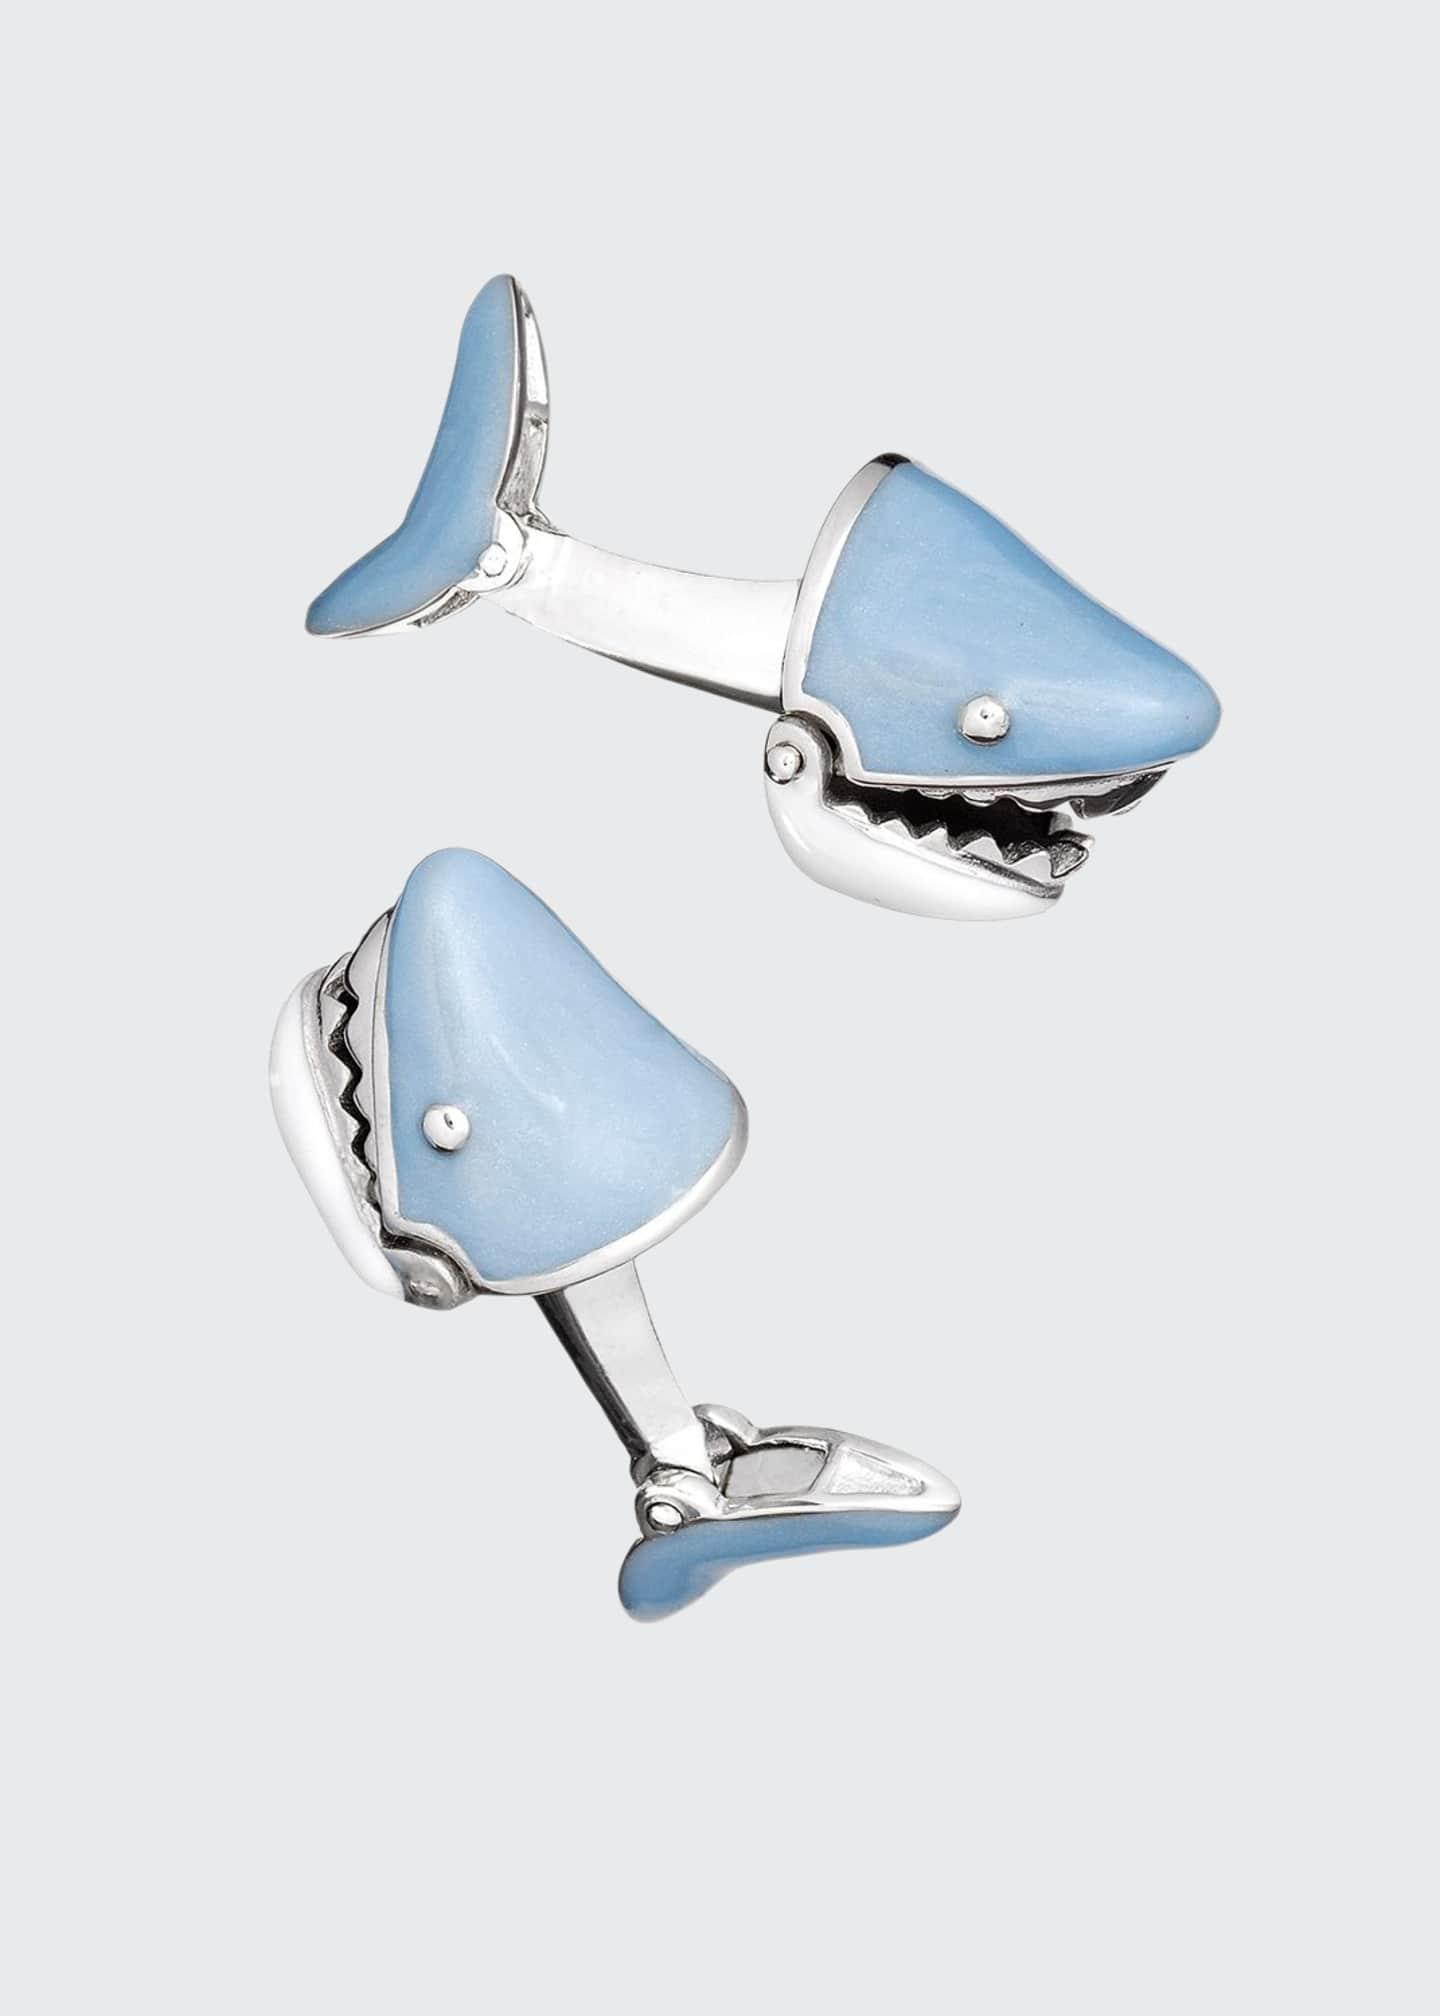 Jan Leslie Movable Shark Face Cuff Links